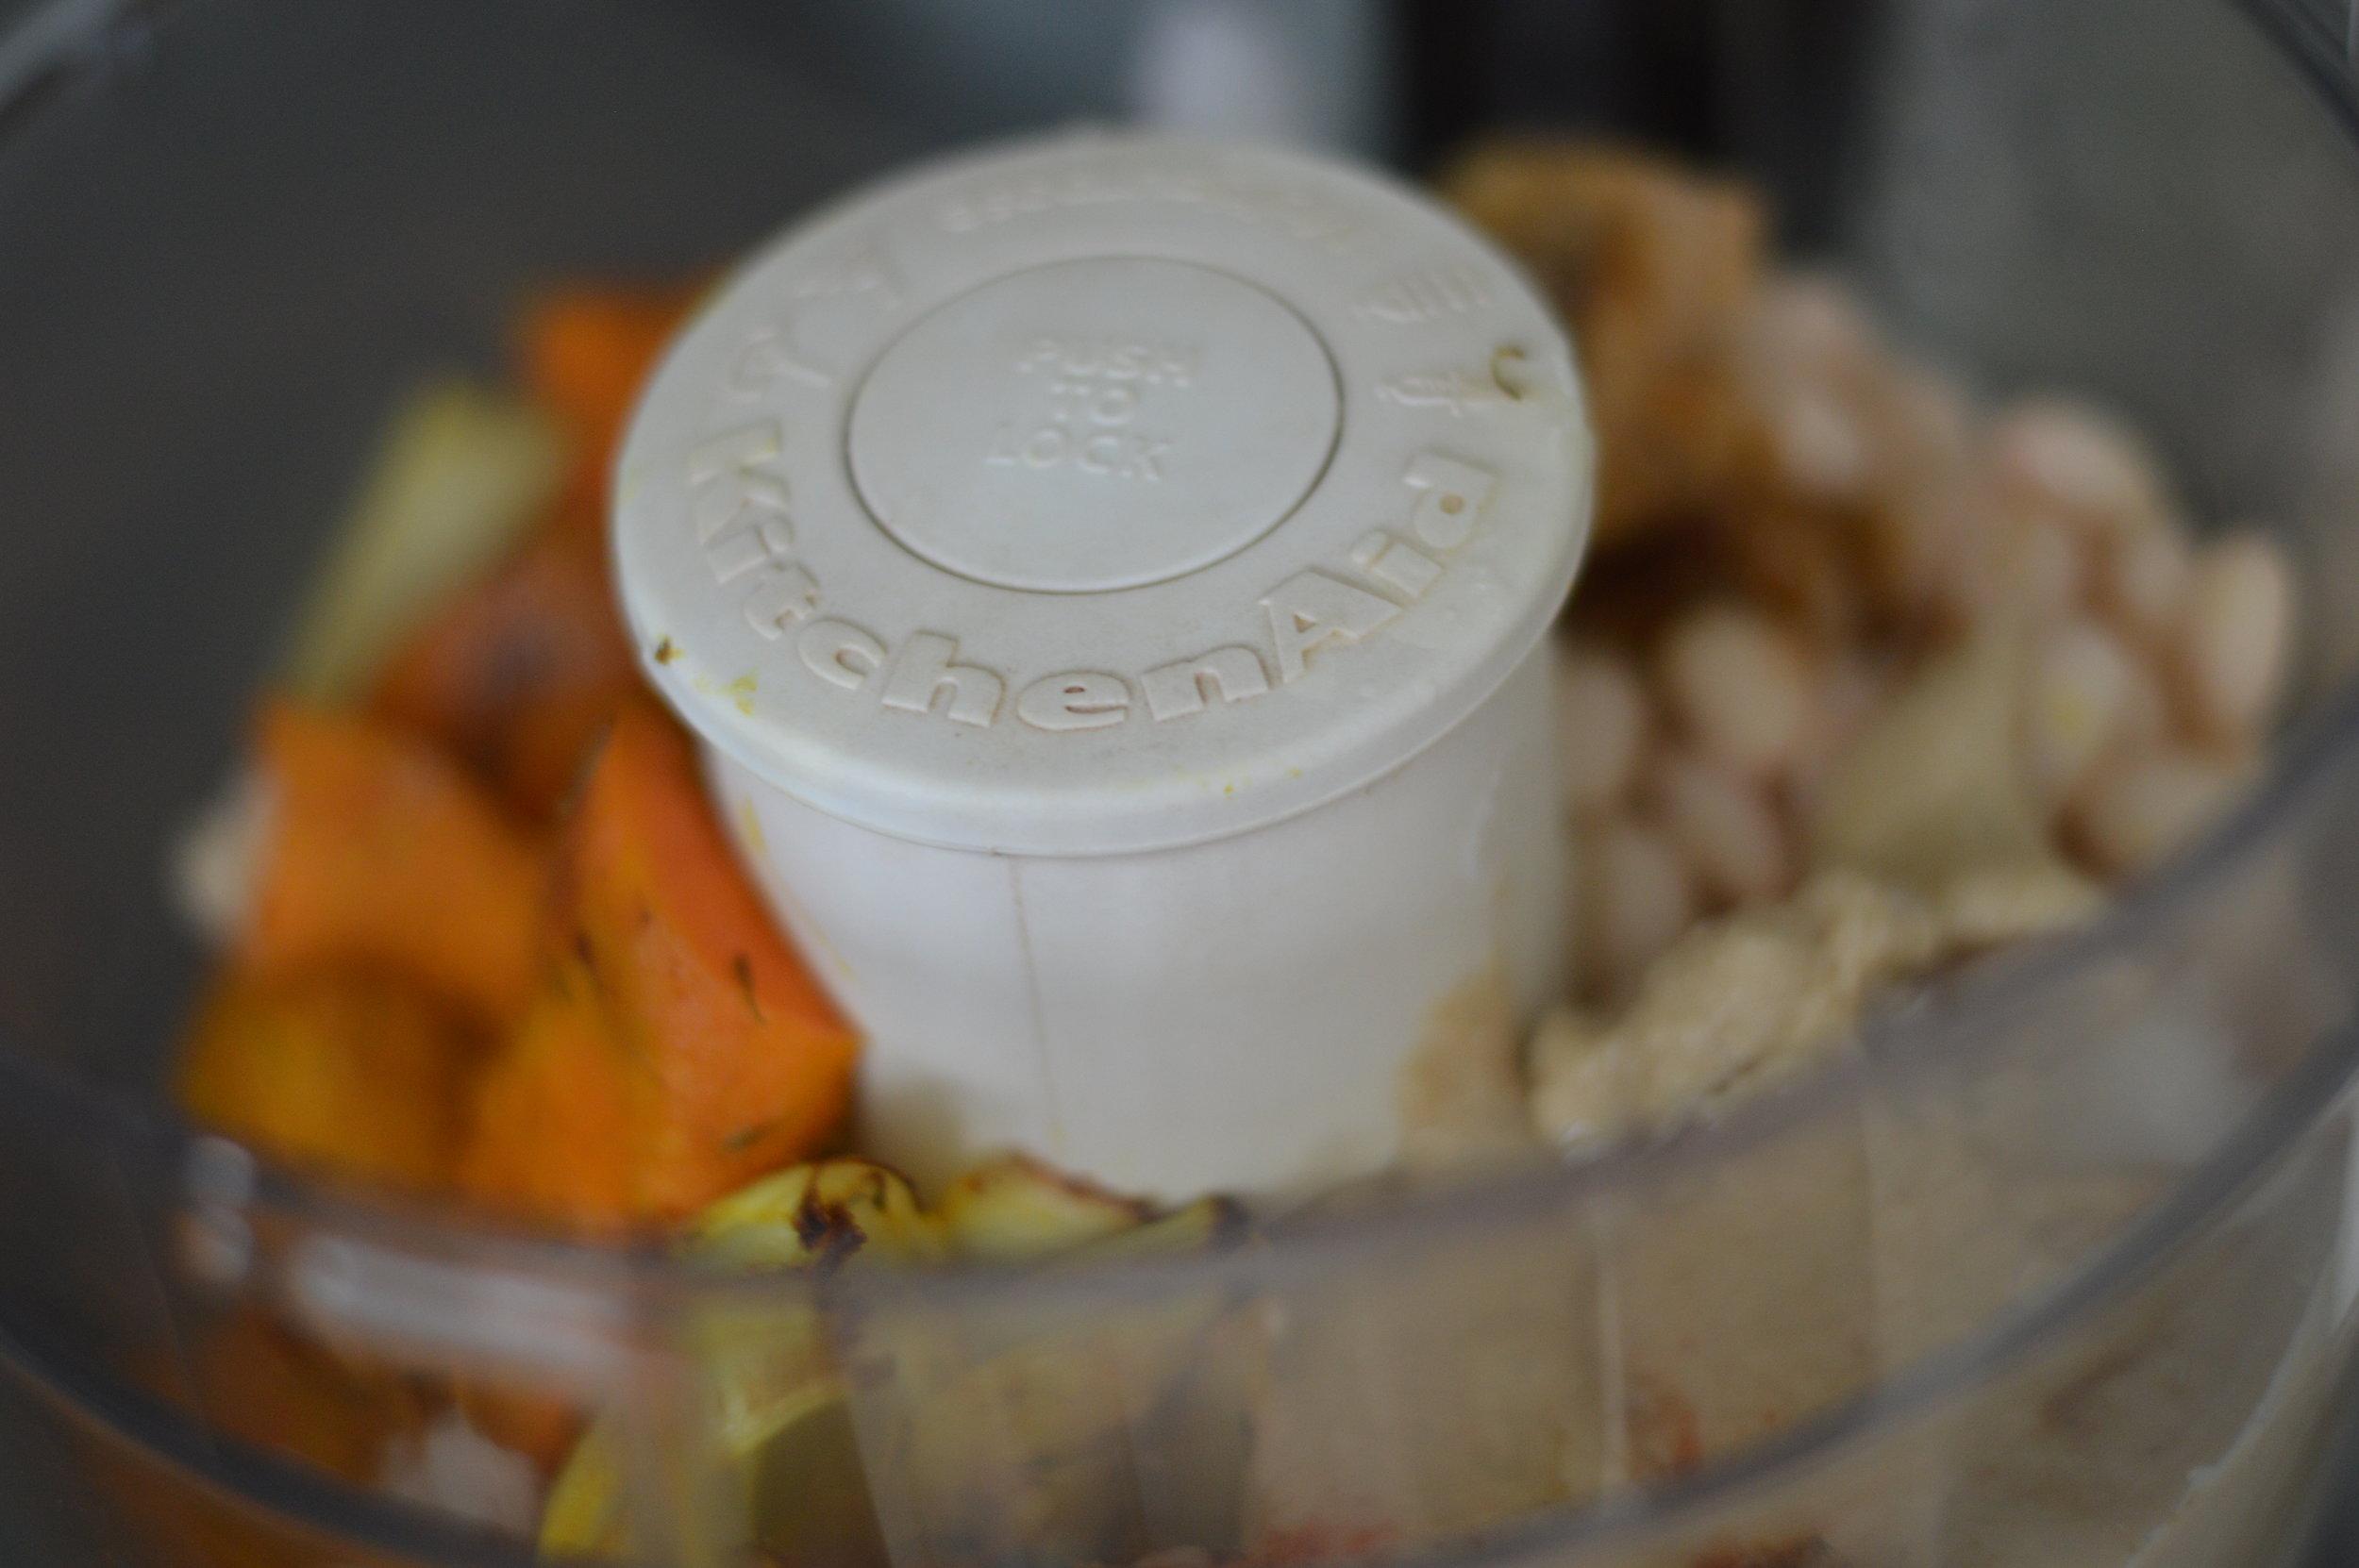 Throw all ingredience in a food processor or blender